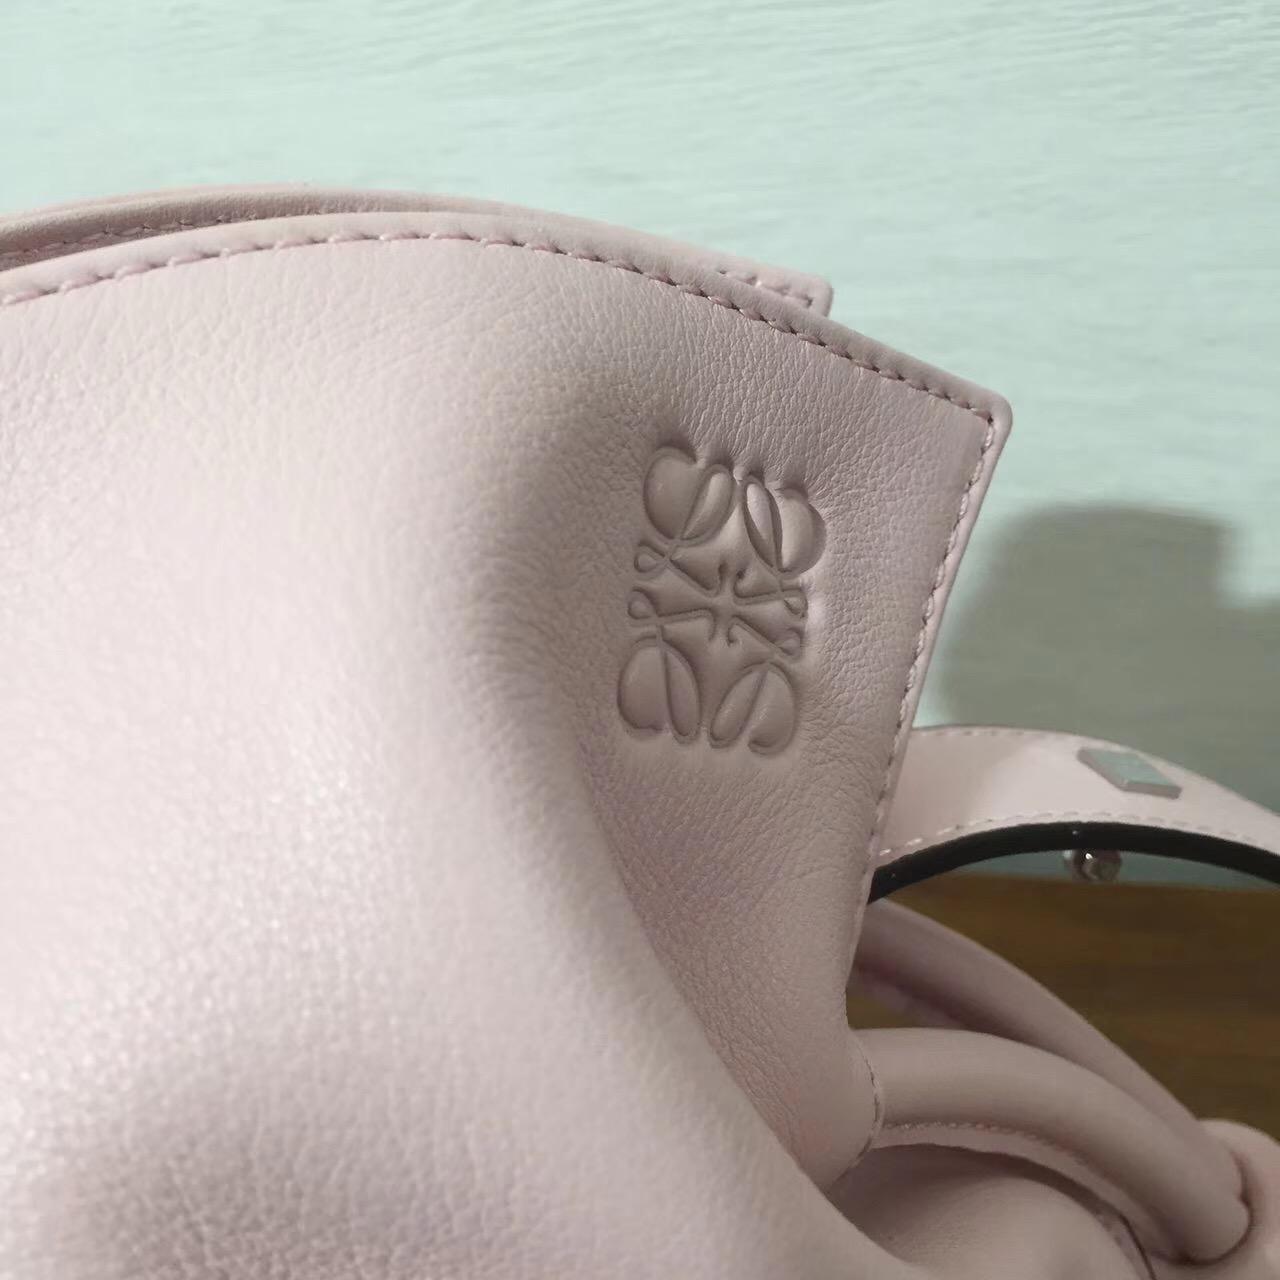 Loewe羅意威绳结手袋 Flamenco Knot Bag 粉色